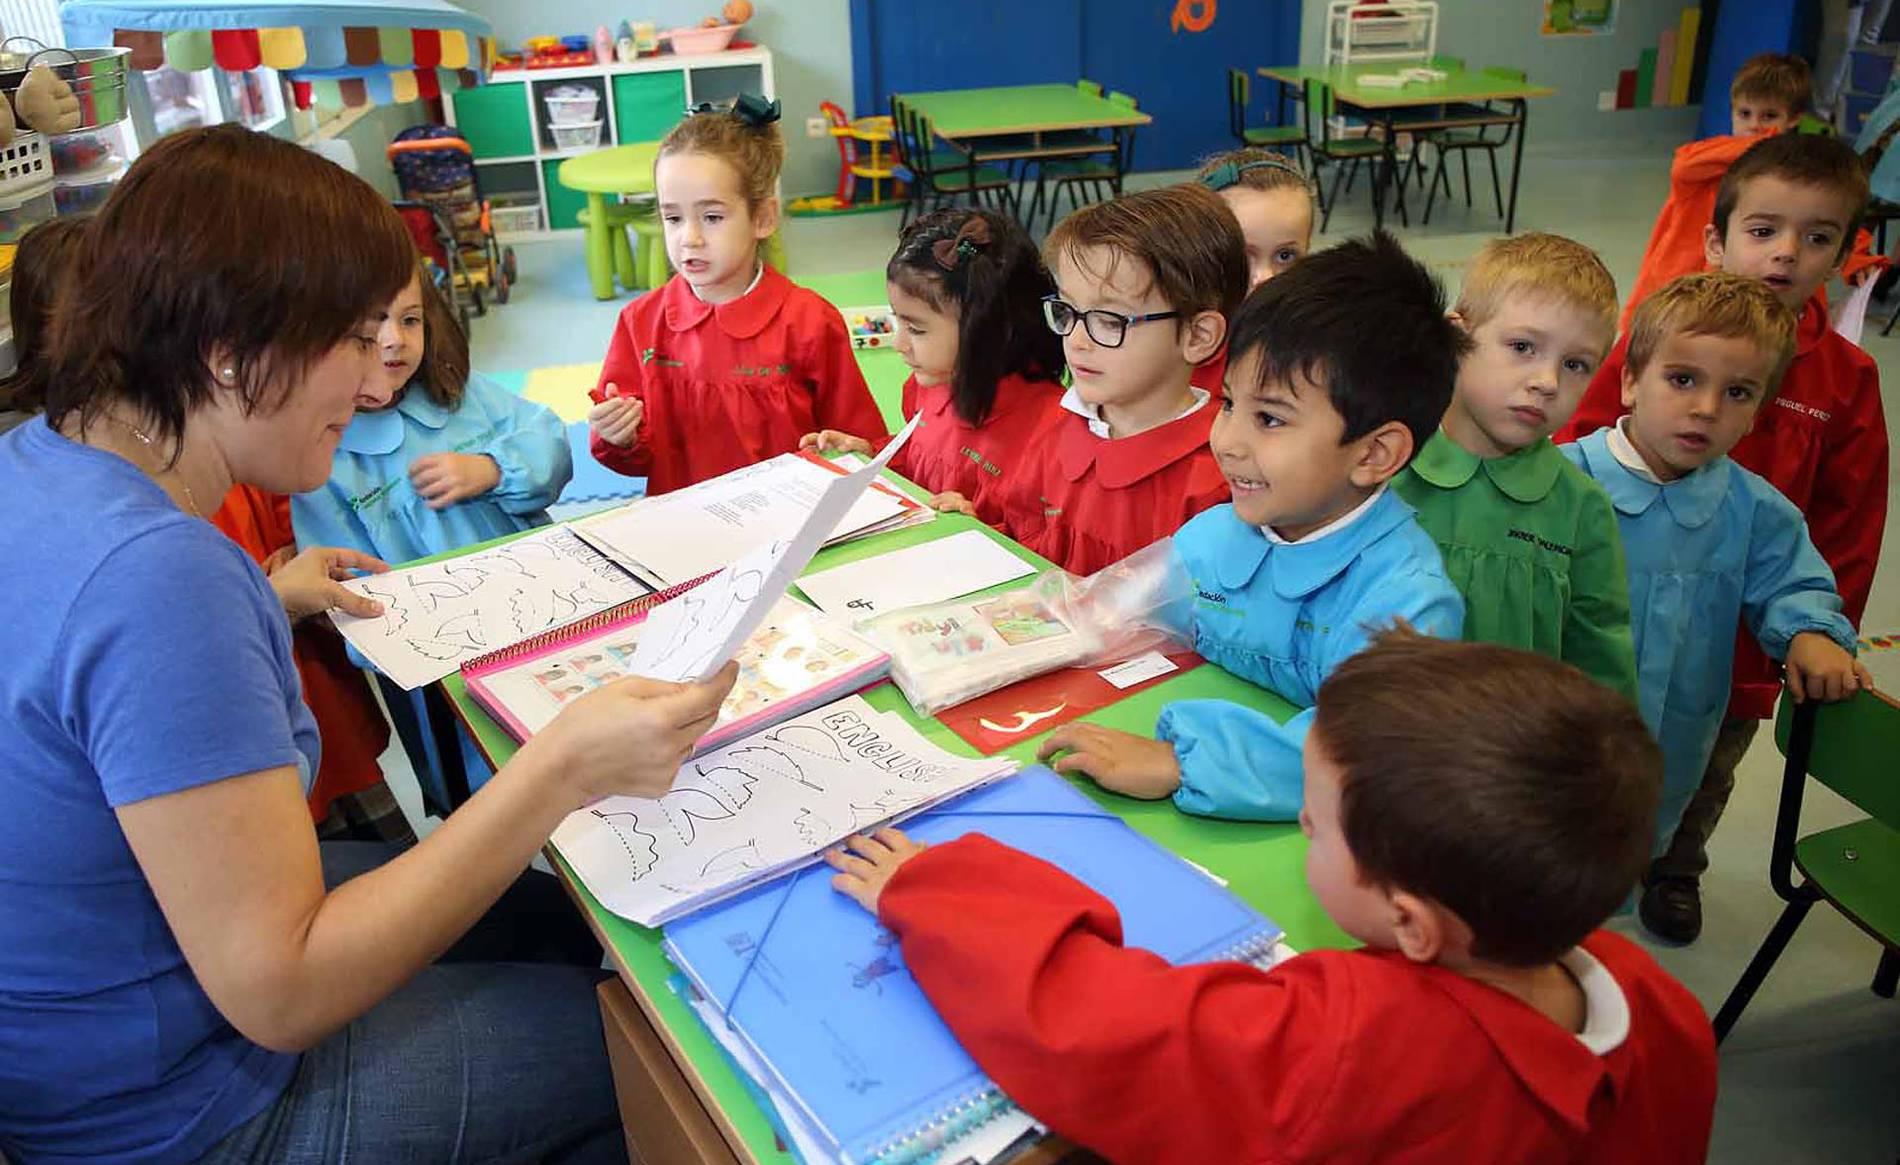 Colegio Santa Teresa (1/34) - Alumnado del colegio Santa Teresa - Navarra -